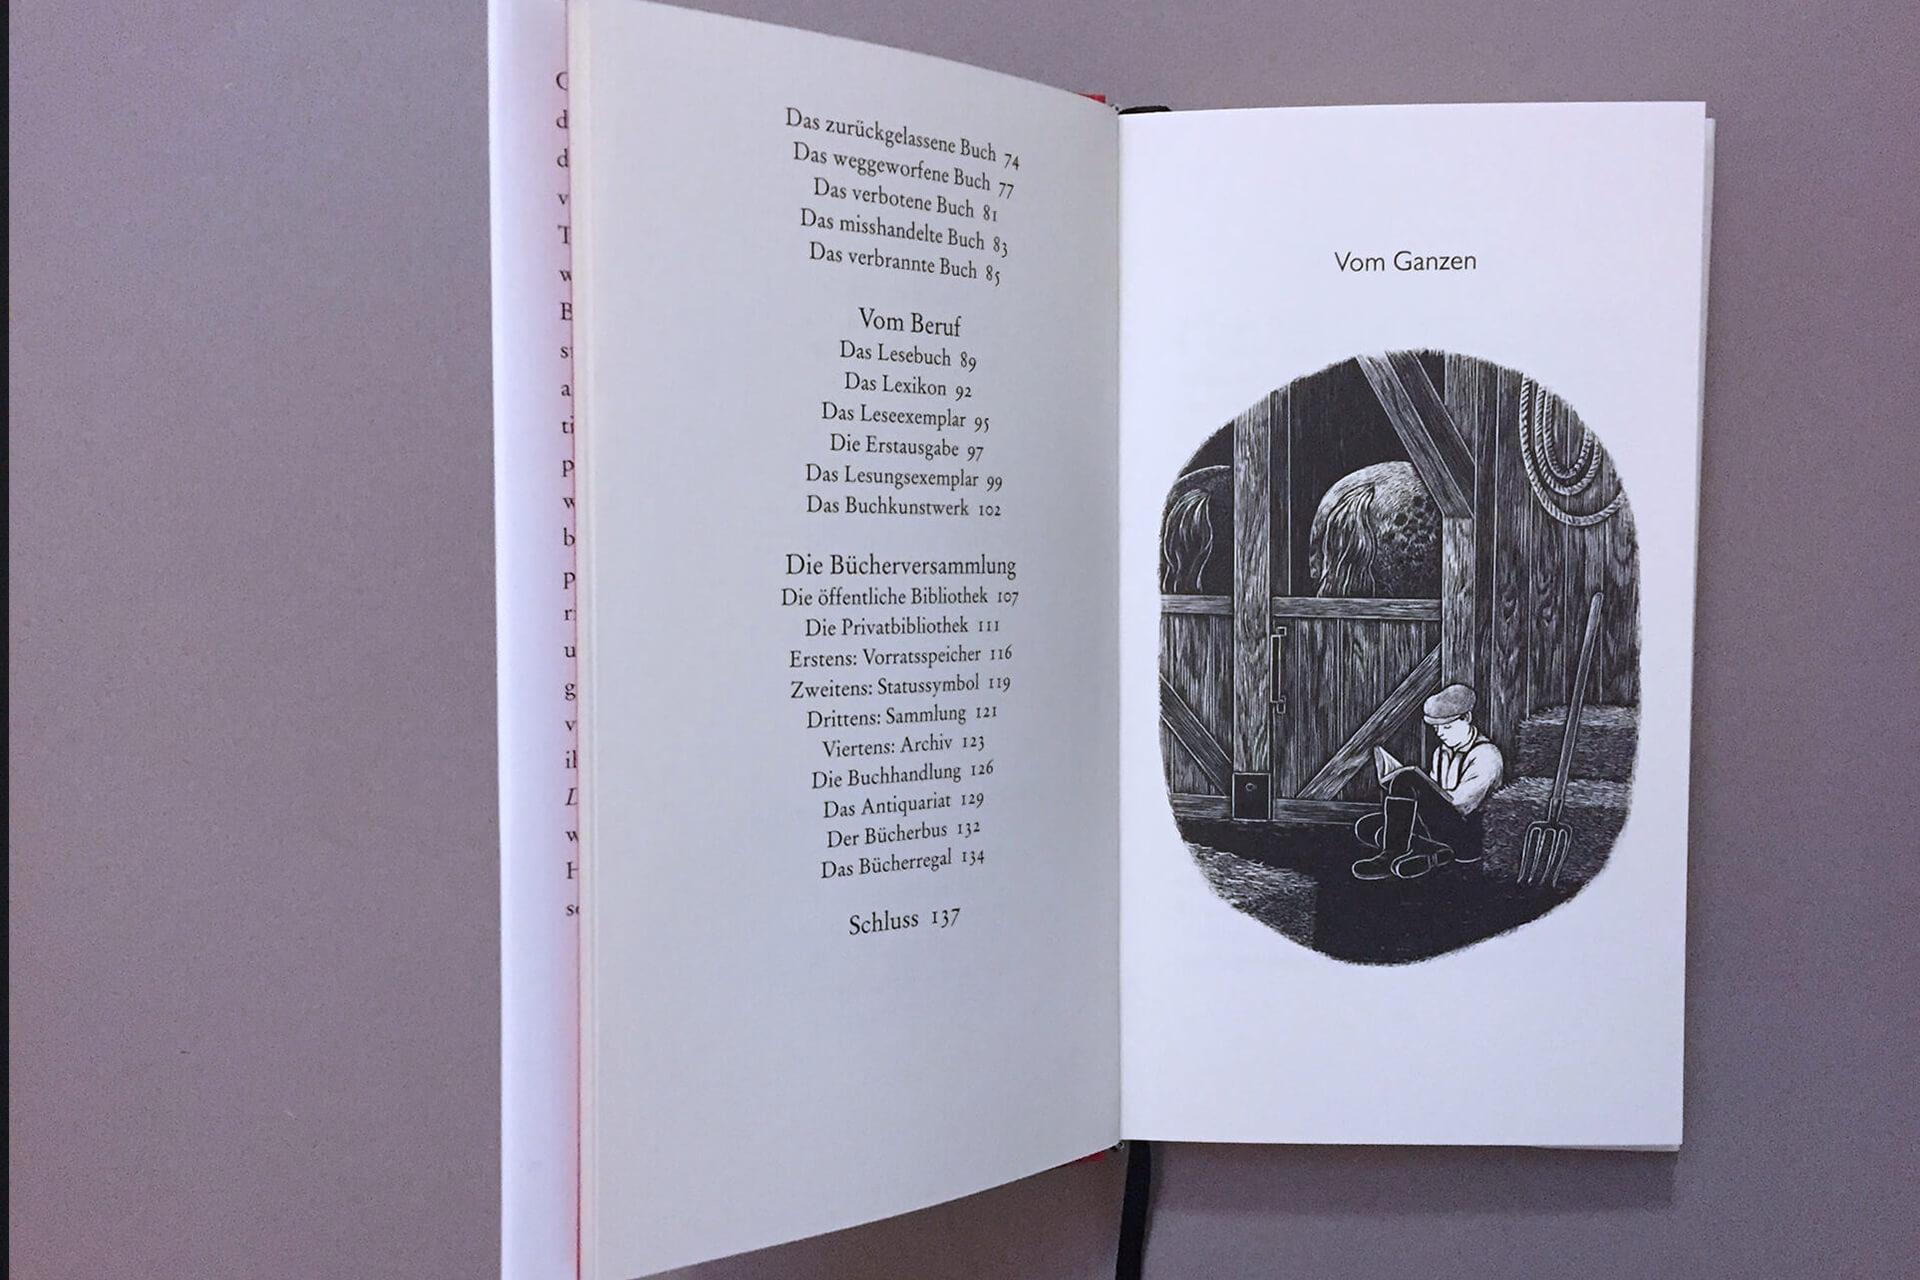 Spinnen-Buch-6